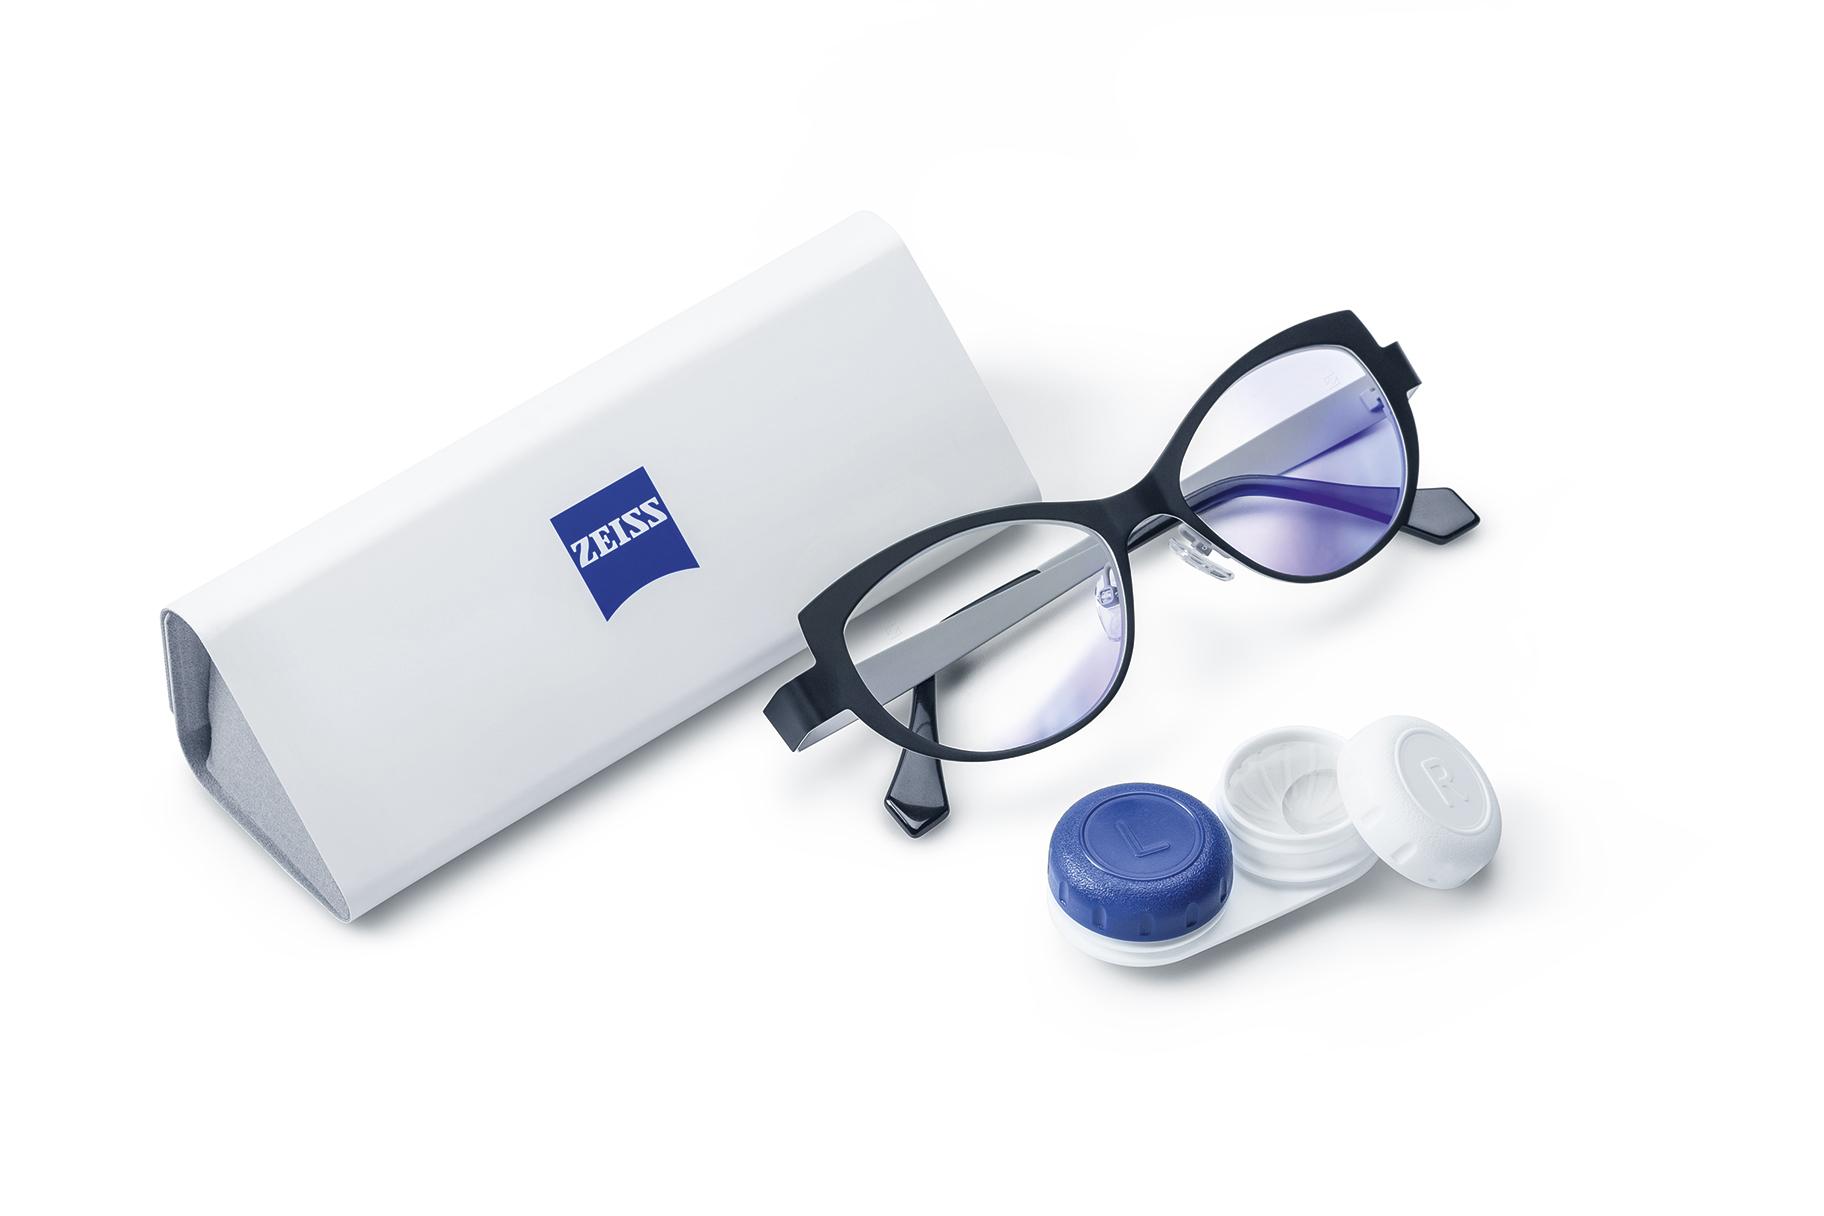 zeiss energizeme eyeglass lenses for contact lens wearers